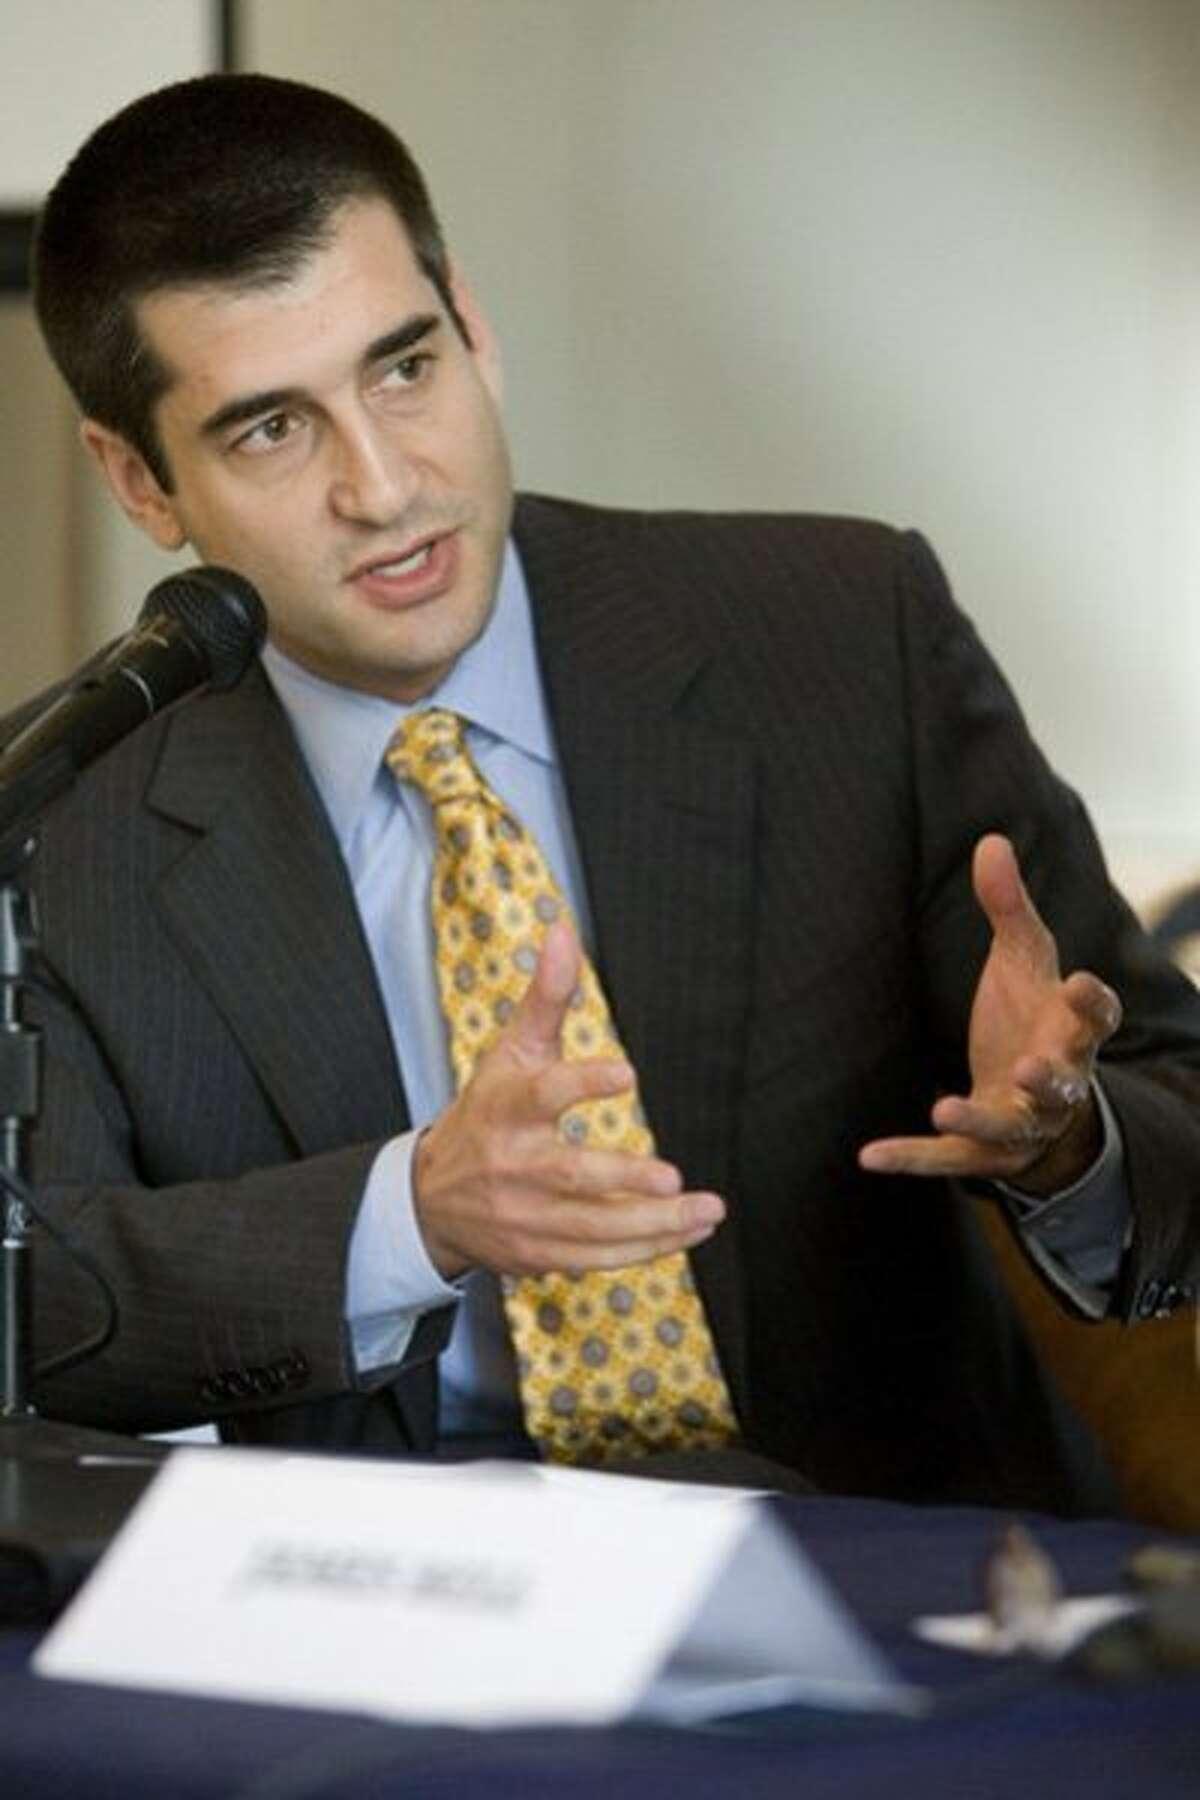 District Attorney candidate David Onek.